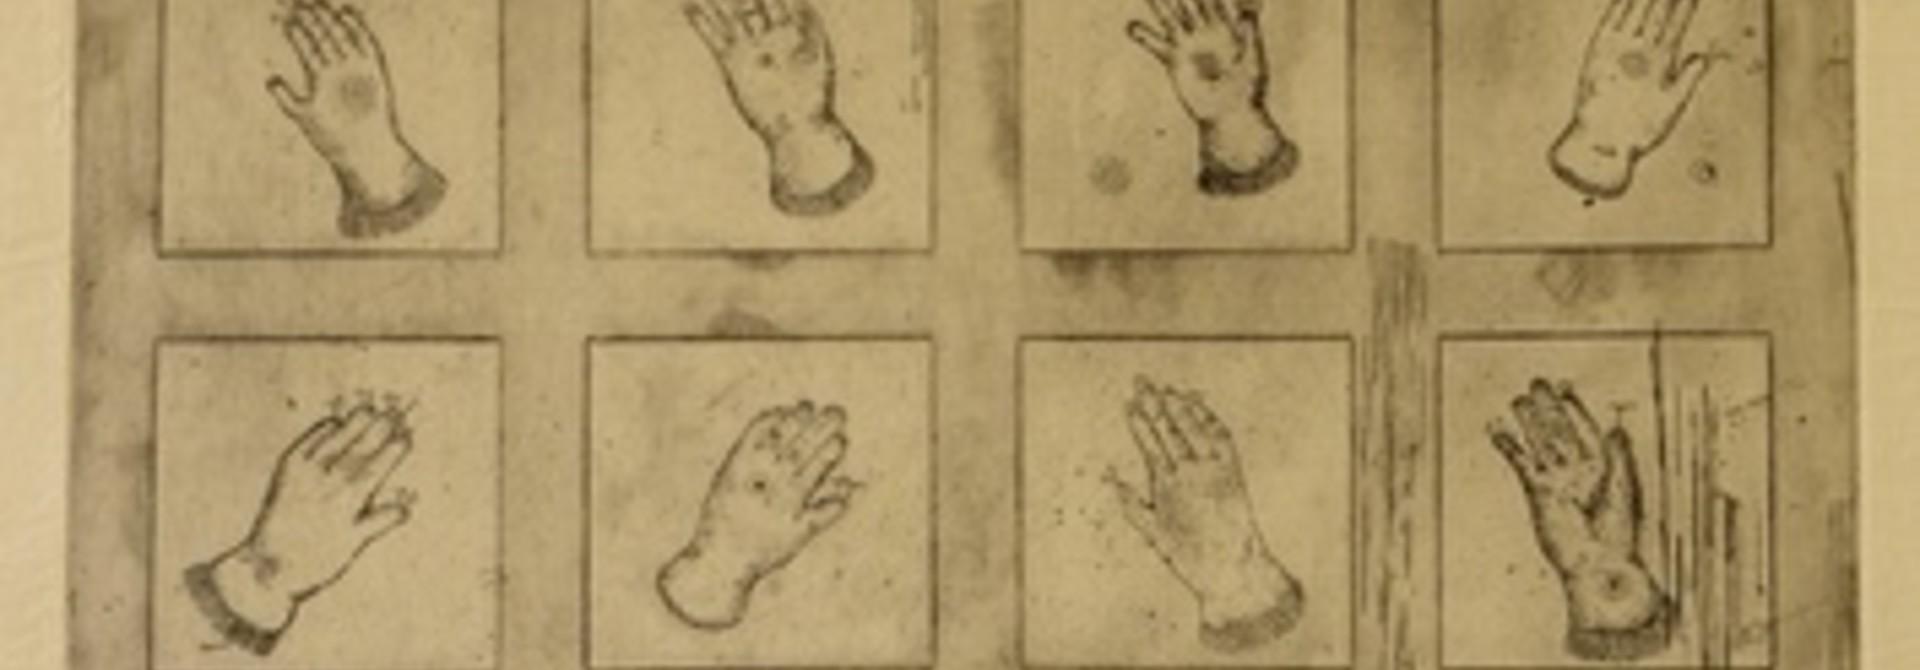 Gaudi Hand